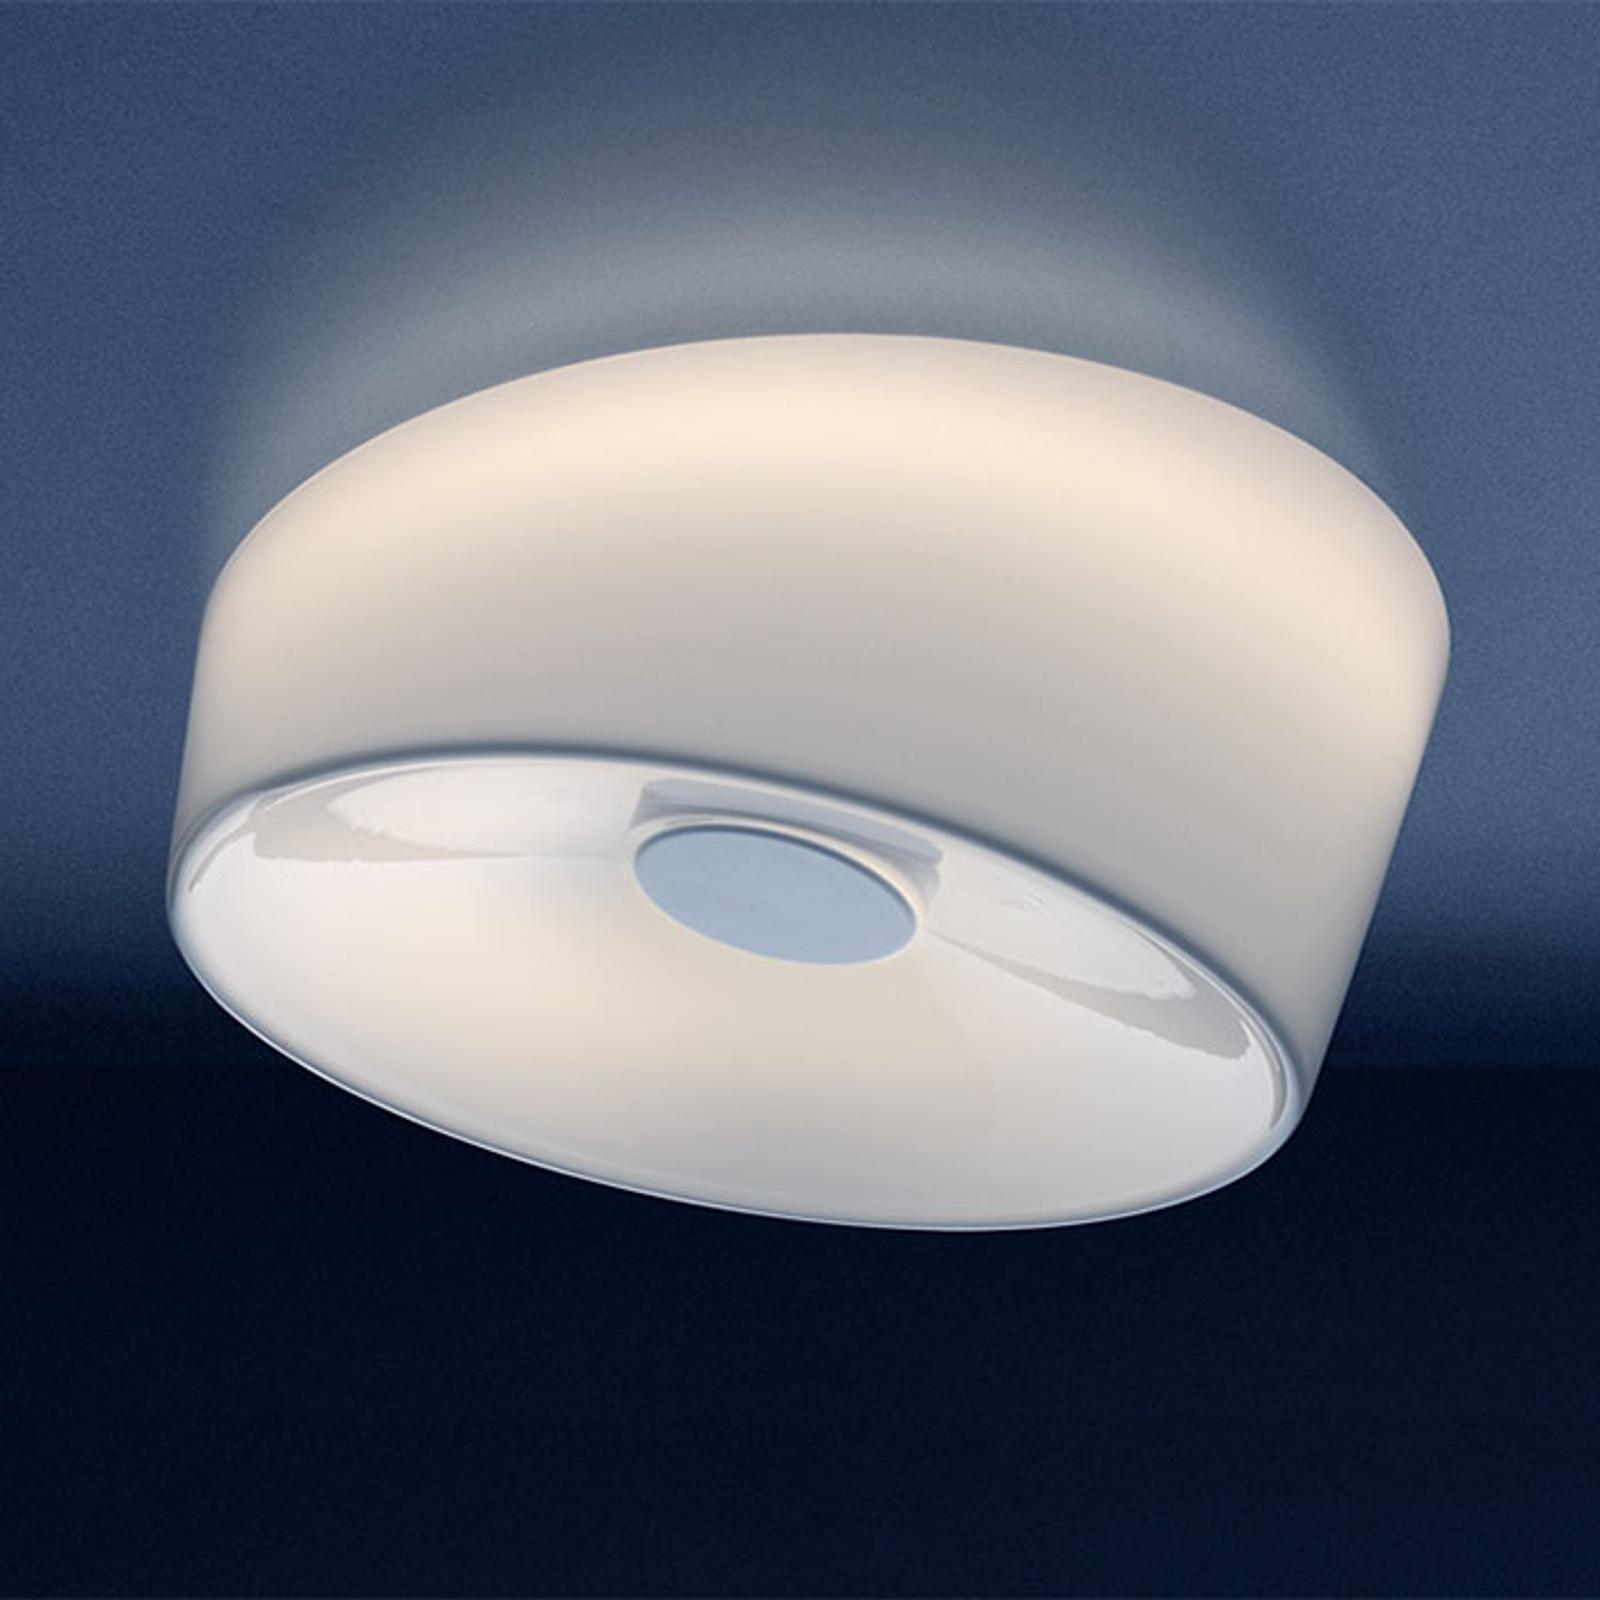 Foscarini Lumiere XXS hvit LED-taklampe